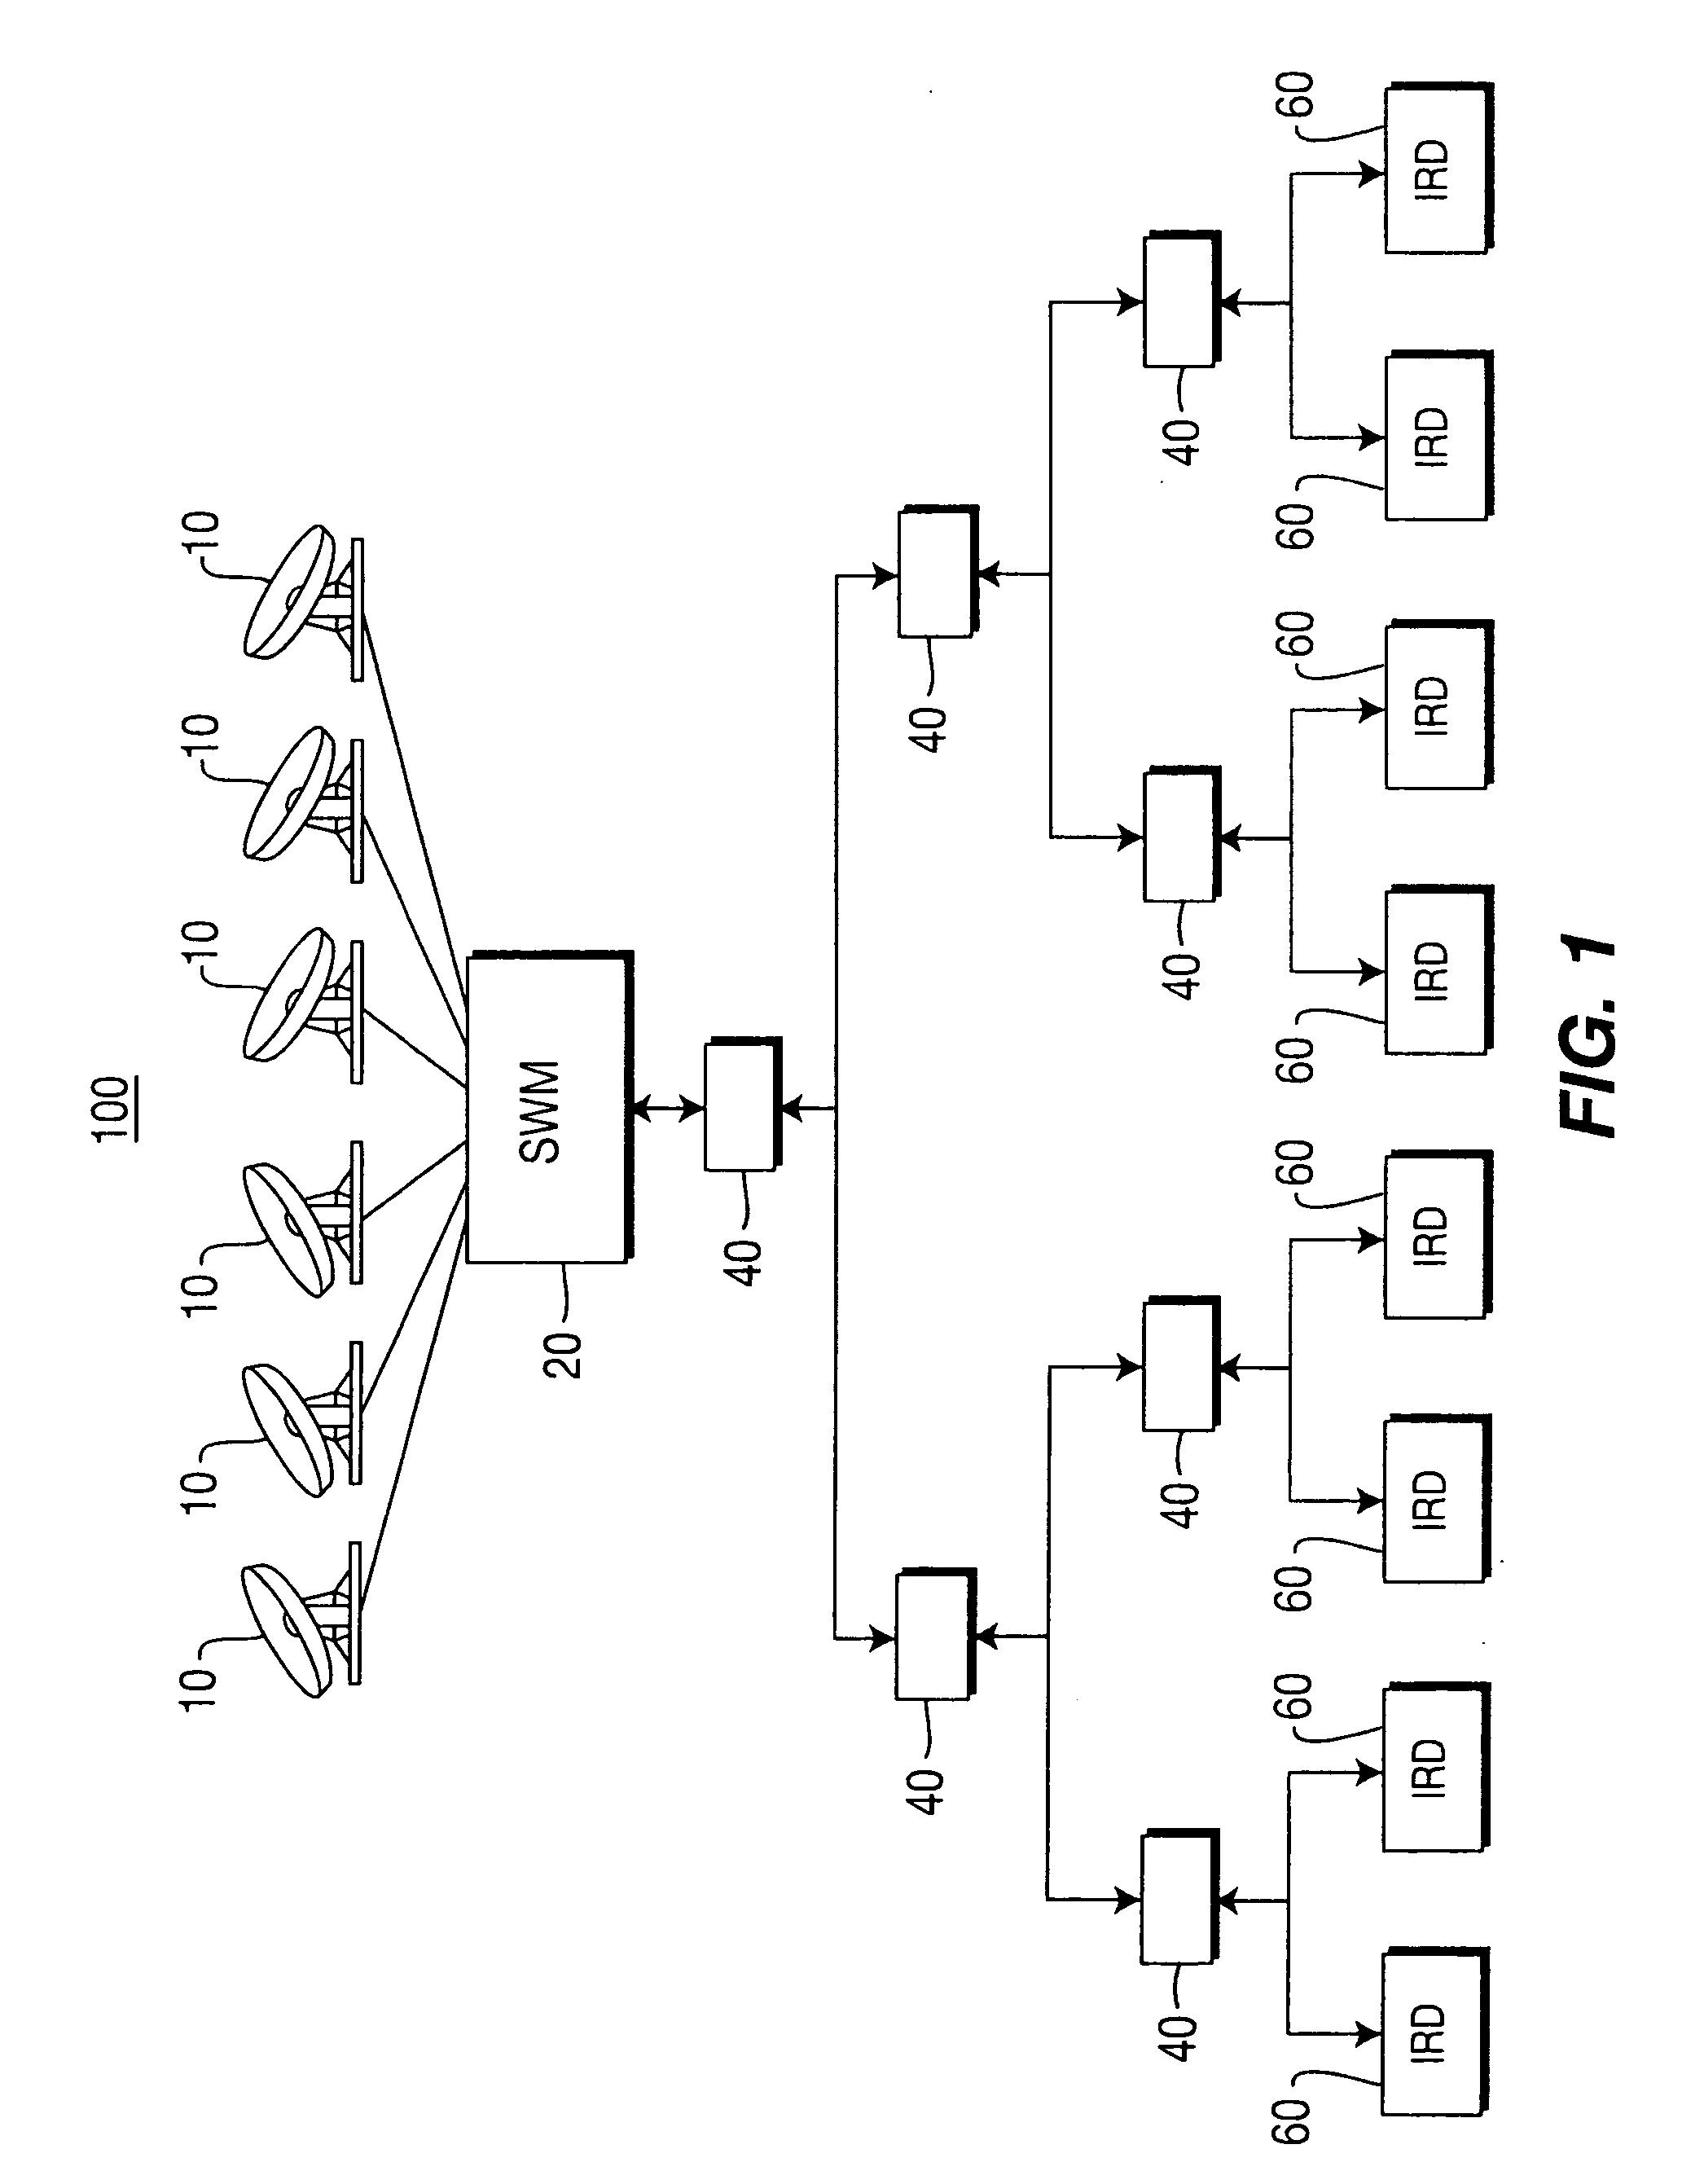 Wrg Yamaha 660 Rhino Wiring Diagram